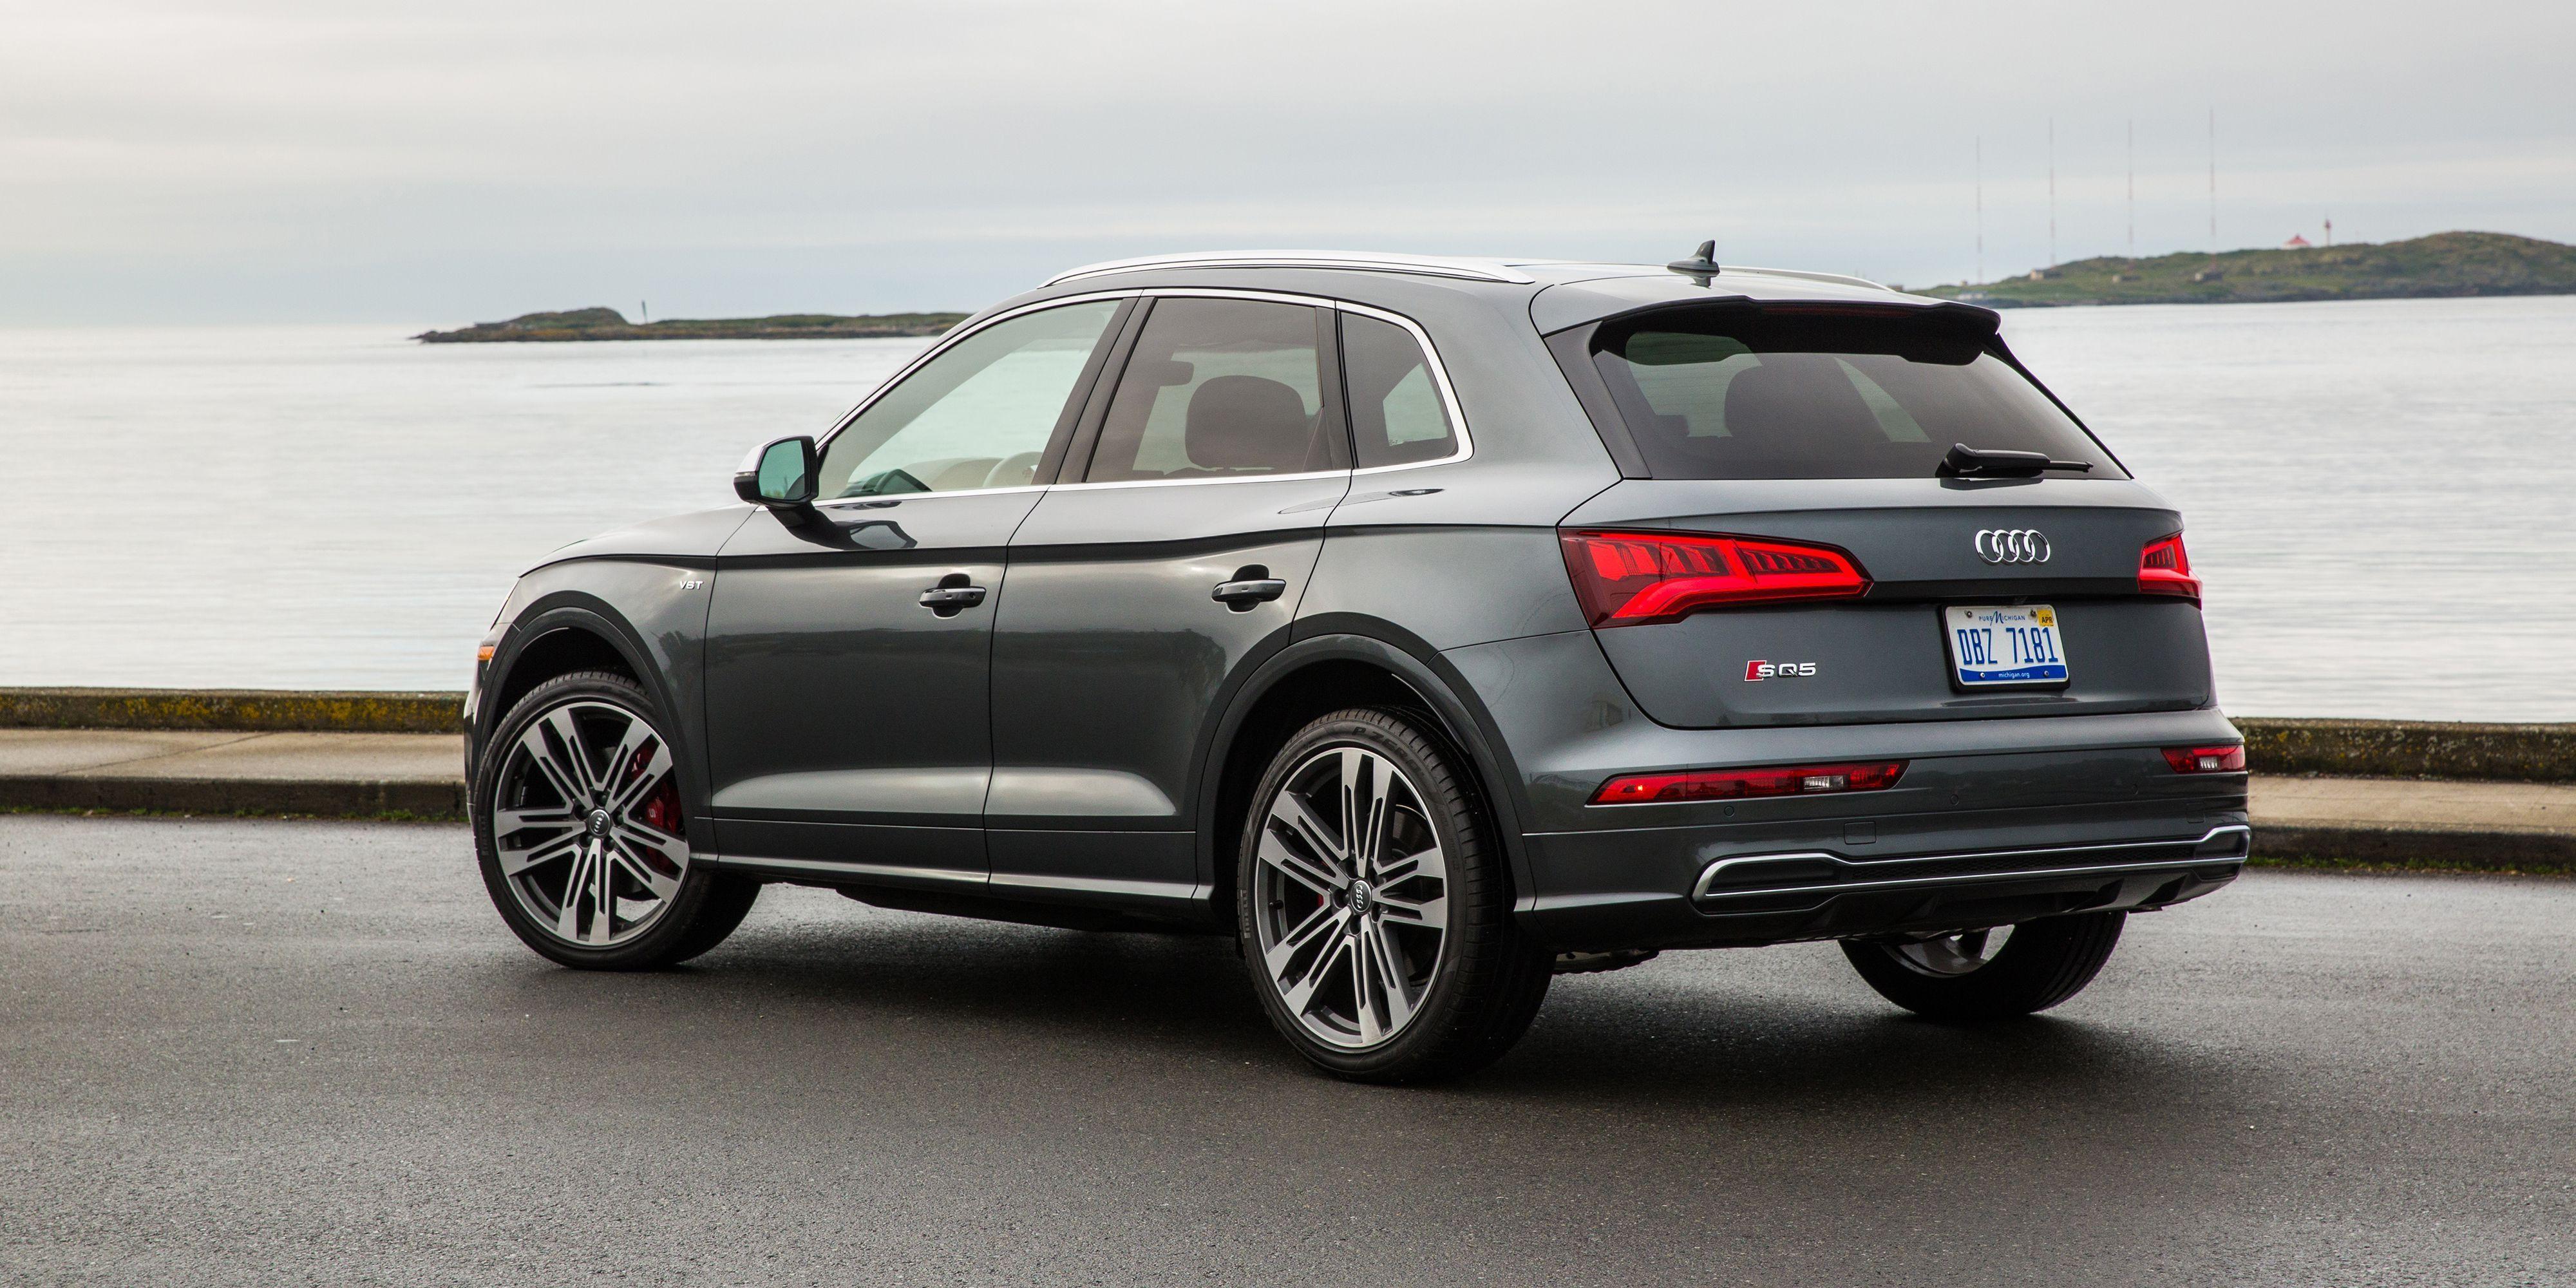 2018 Audi Sq5 Spy Shoot Car Price 2019 City Vehicles Audi Sq5